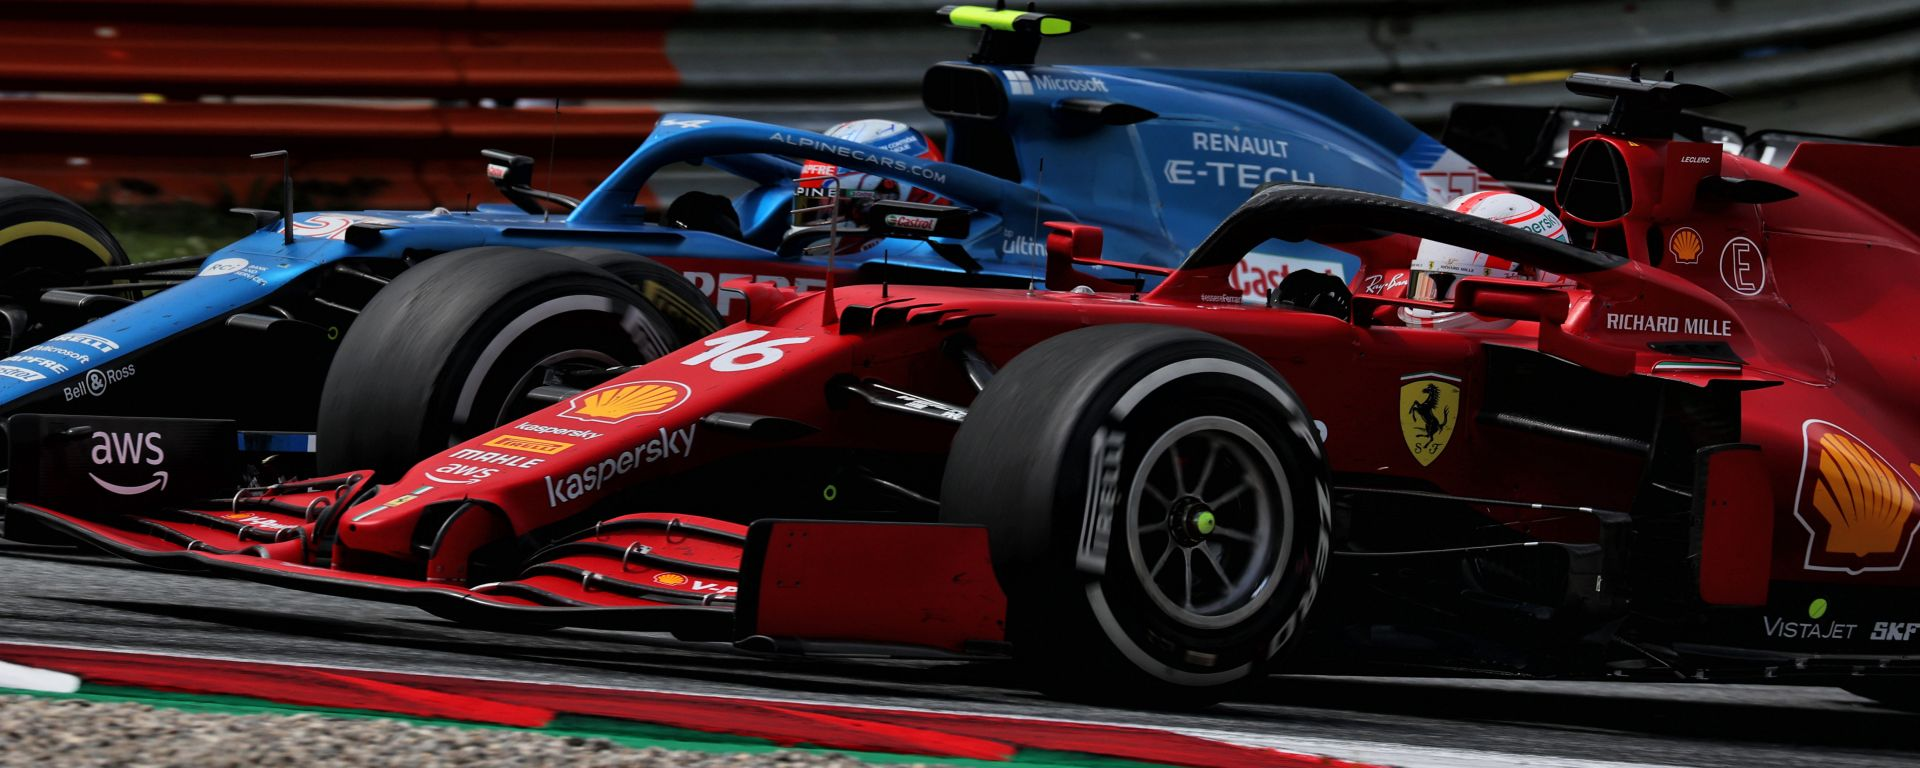 F1 GP Stiria 2021, Spielberg: Charles Leclerc (Ferrari) sorpassa Esteban Ocon (Alpine)